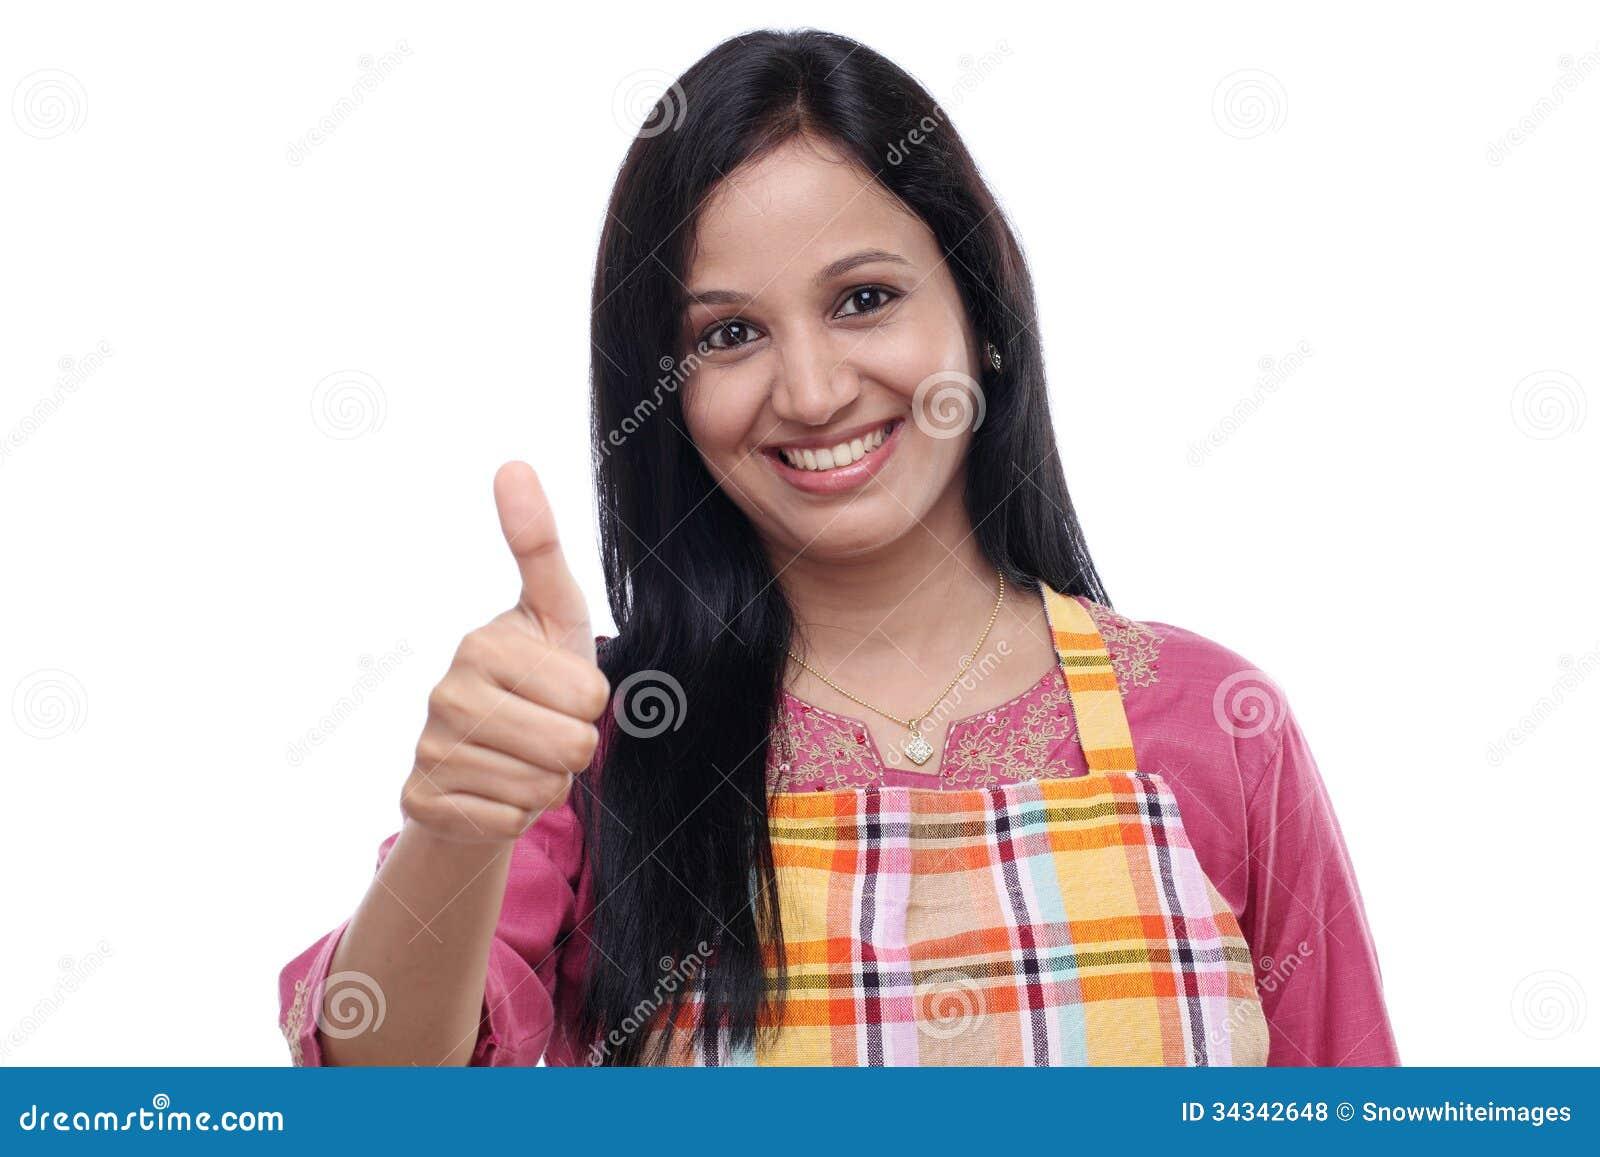 Indian thumb pics 53